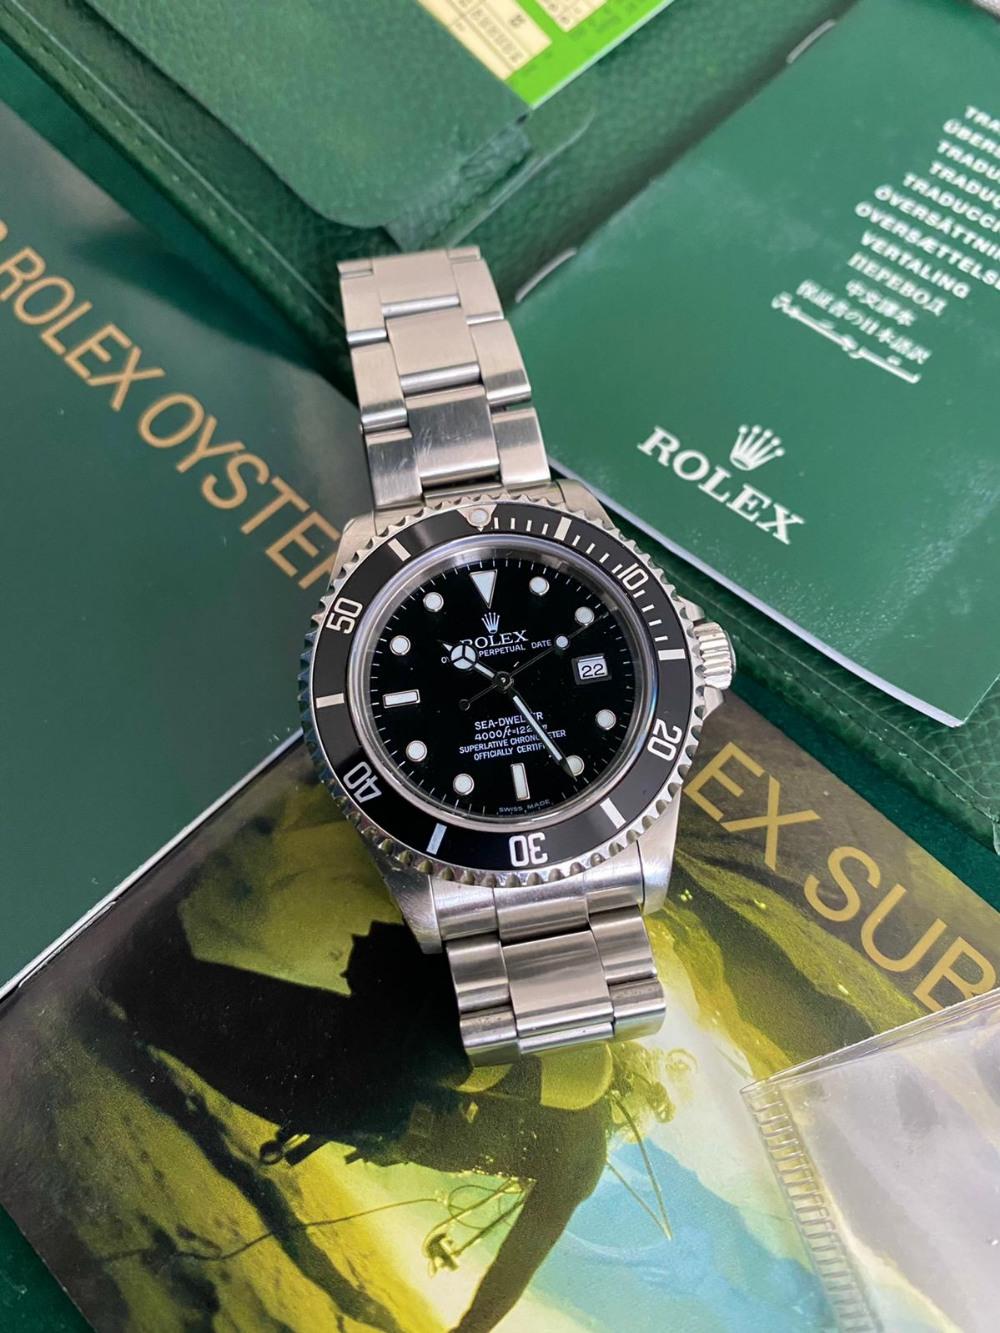 A gent's stainless steel Rolex Oyster Perpetual Date Sea-Dweller bracelet wrist watch, 2004 F Series